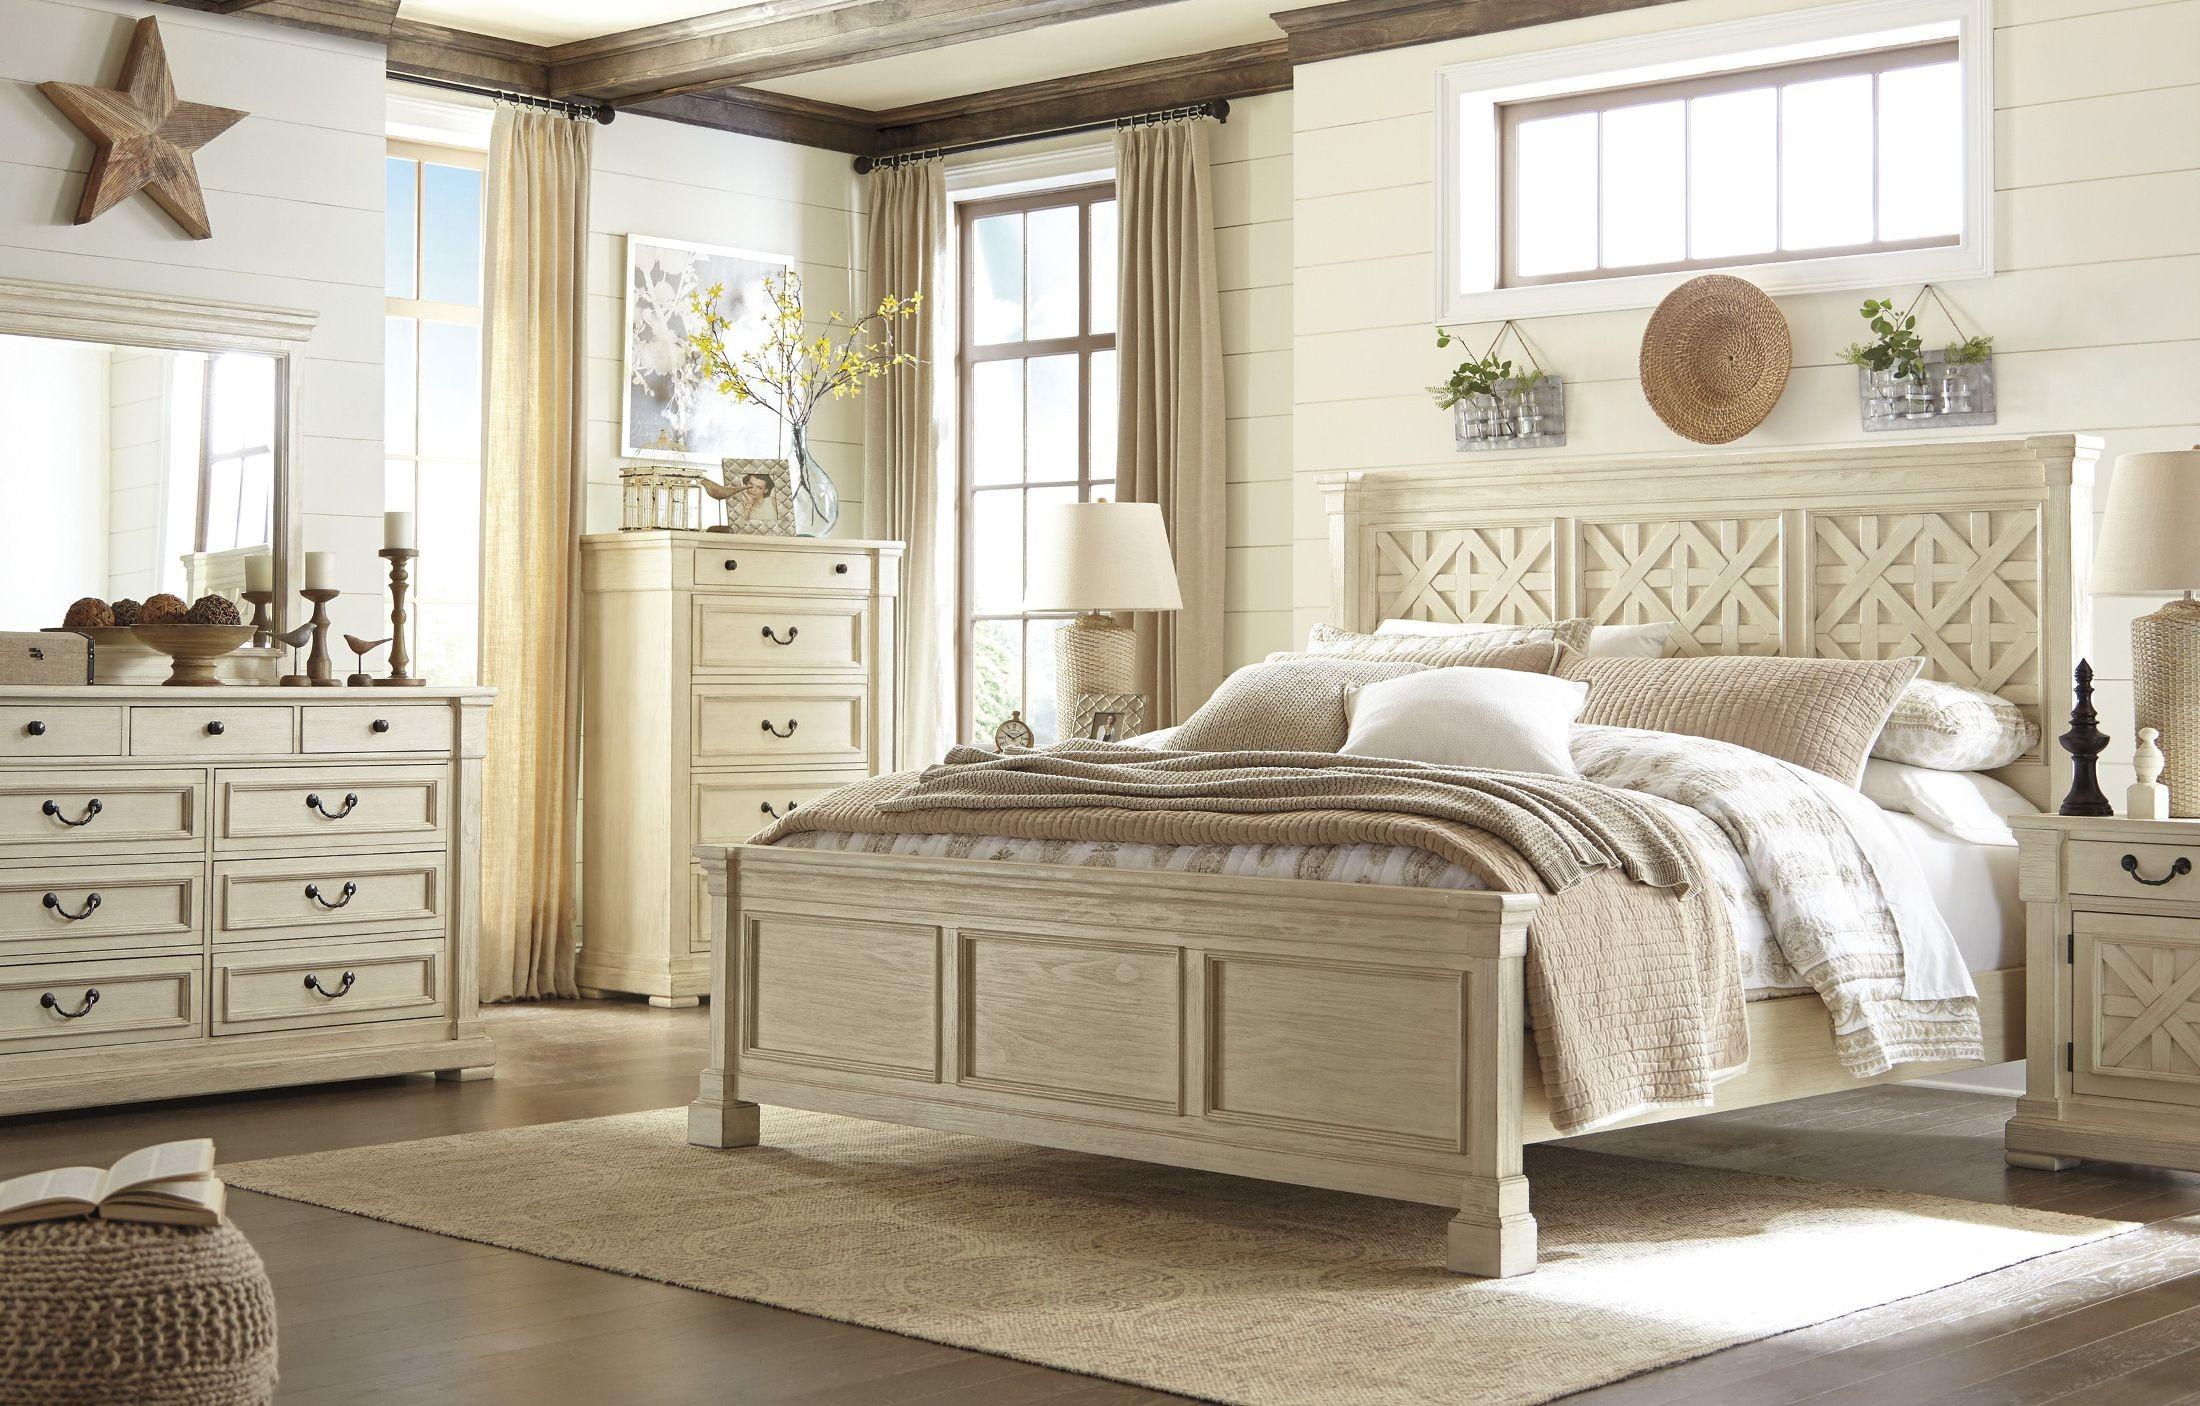 Bolanburg White Panel Bedroom Set, B647 54 57 96, Ashley